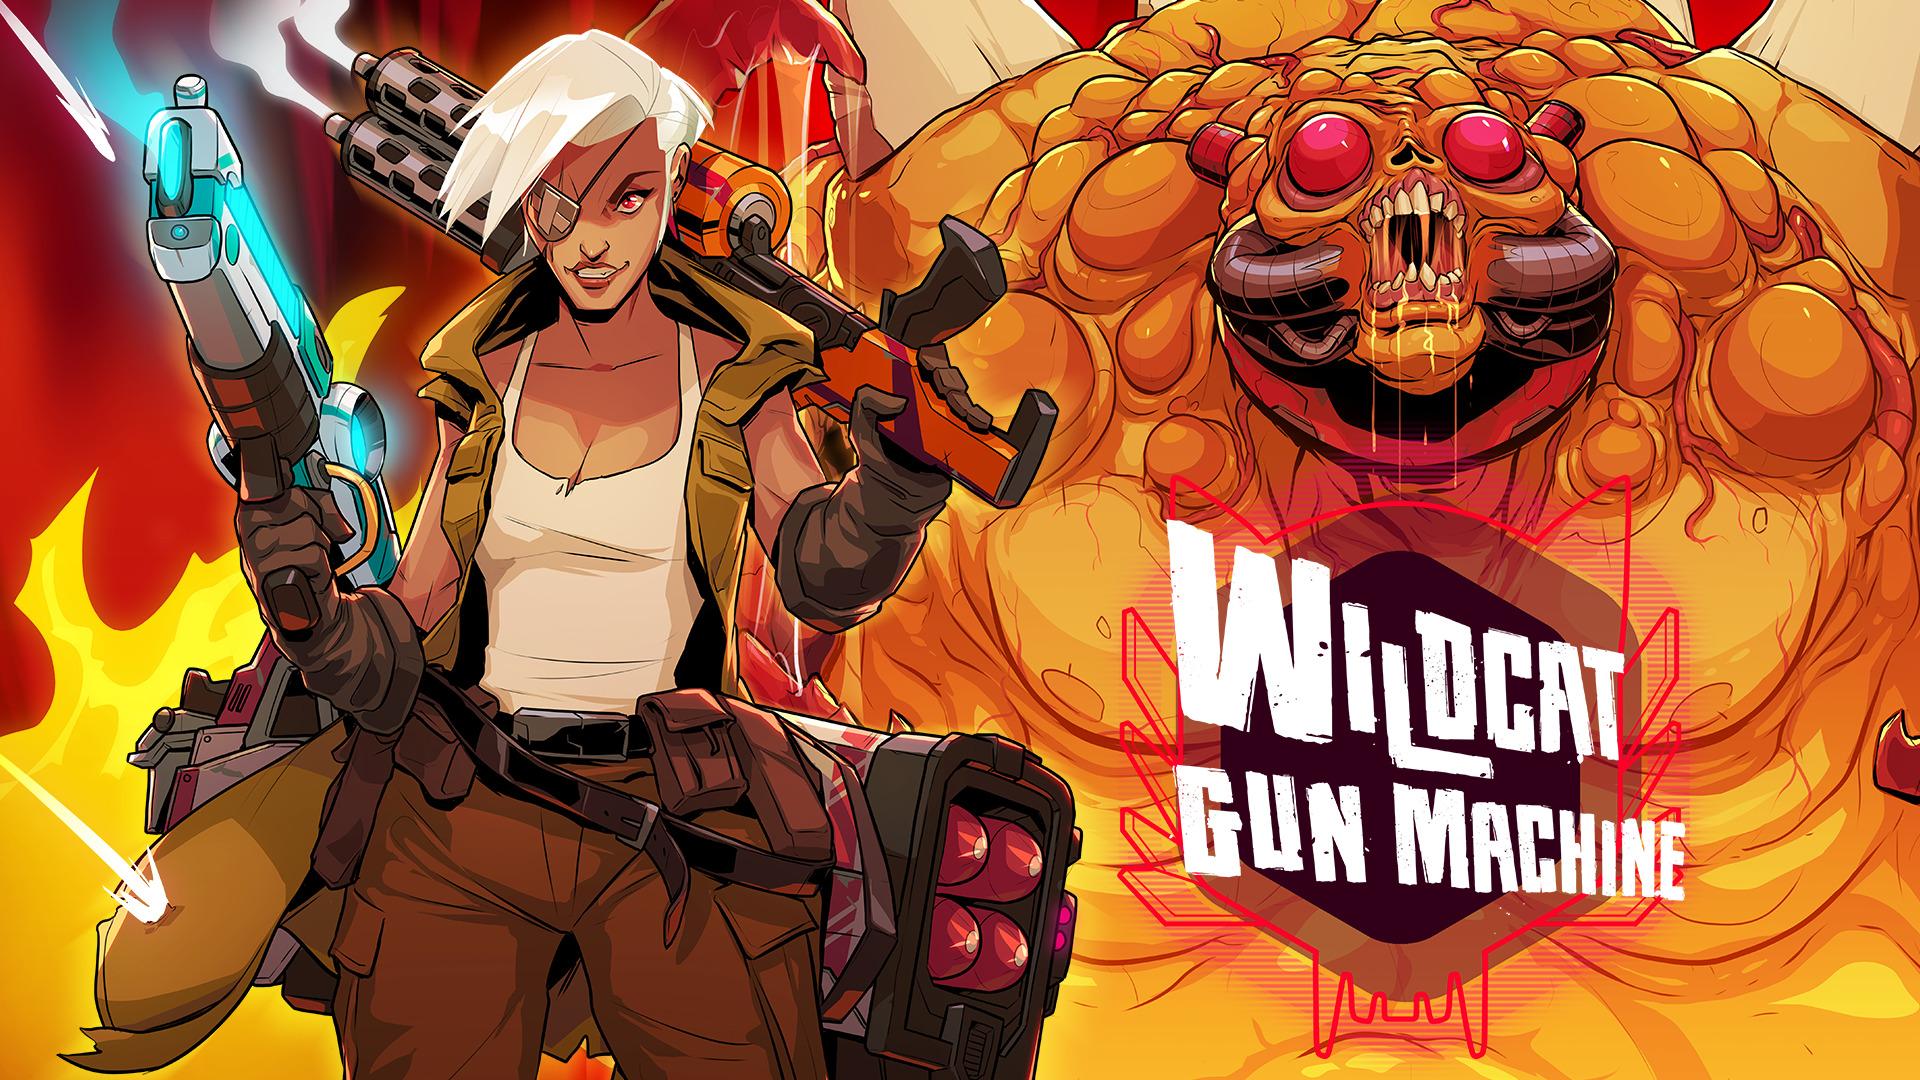 Wildcat Gun Machine